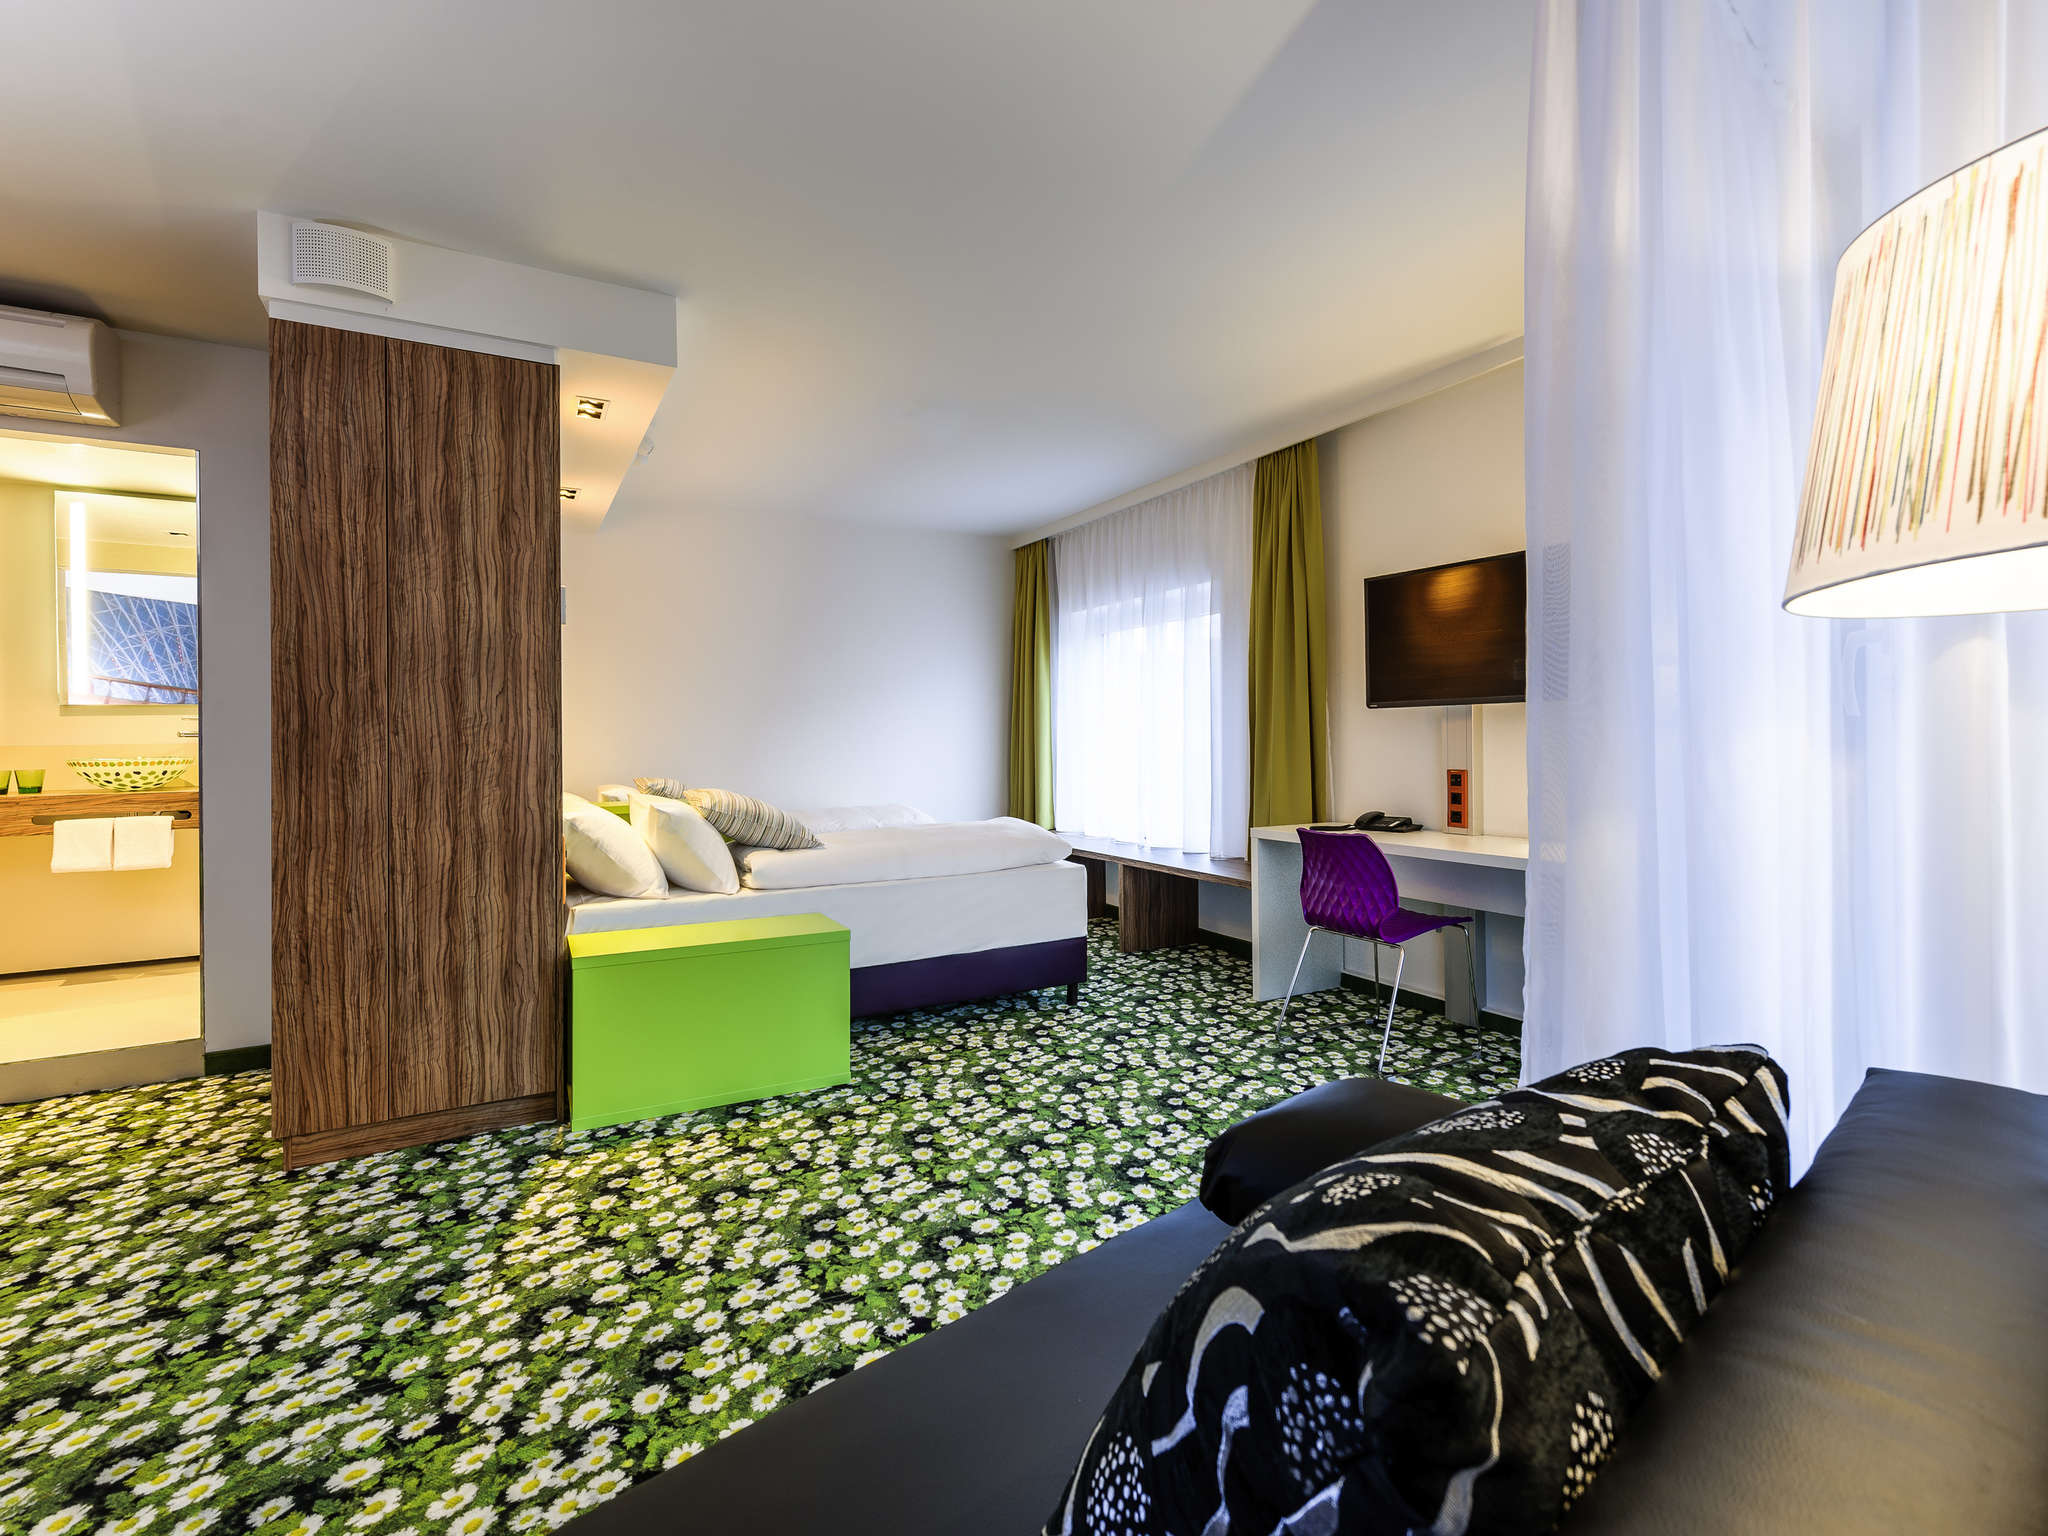 Room Photo 3890469 Hotel Ibis Styles Wien City Hotel